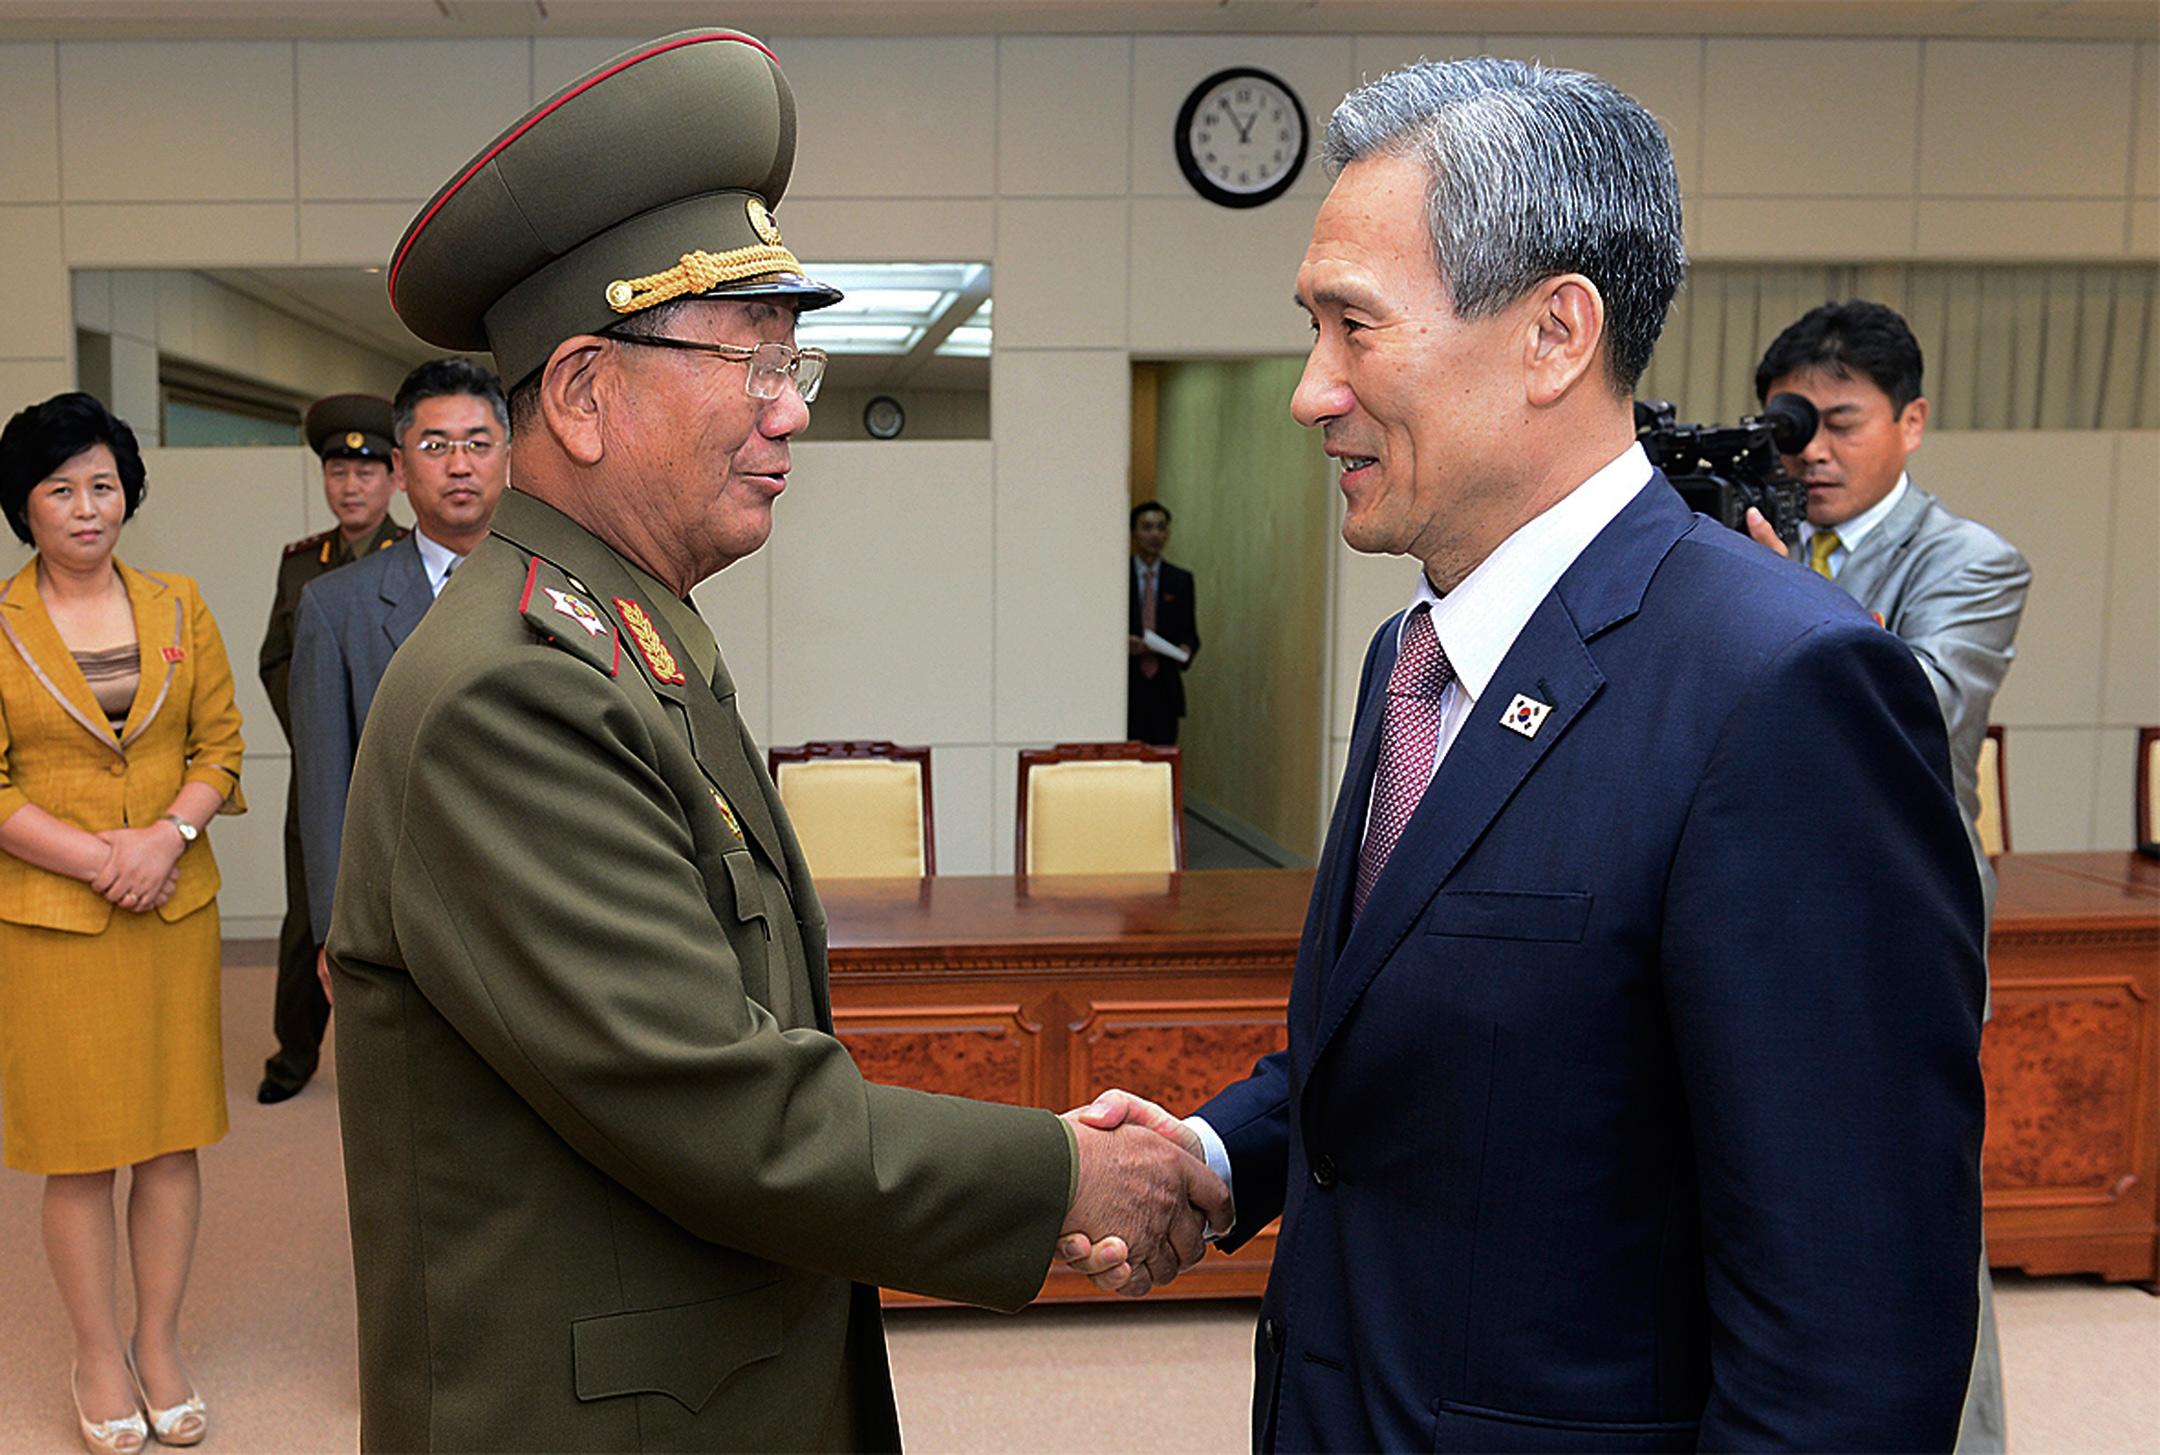 Korean leaders shake hands in Panmunjom in the Demilitarized Zone